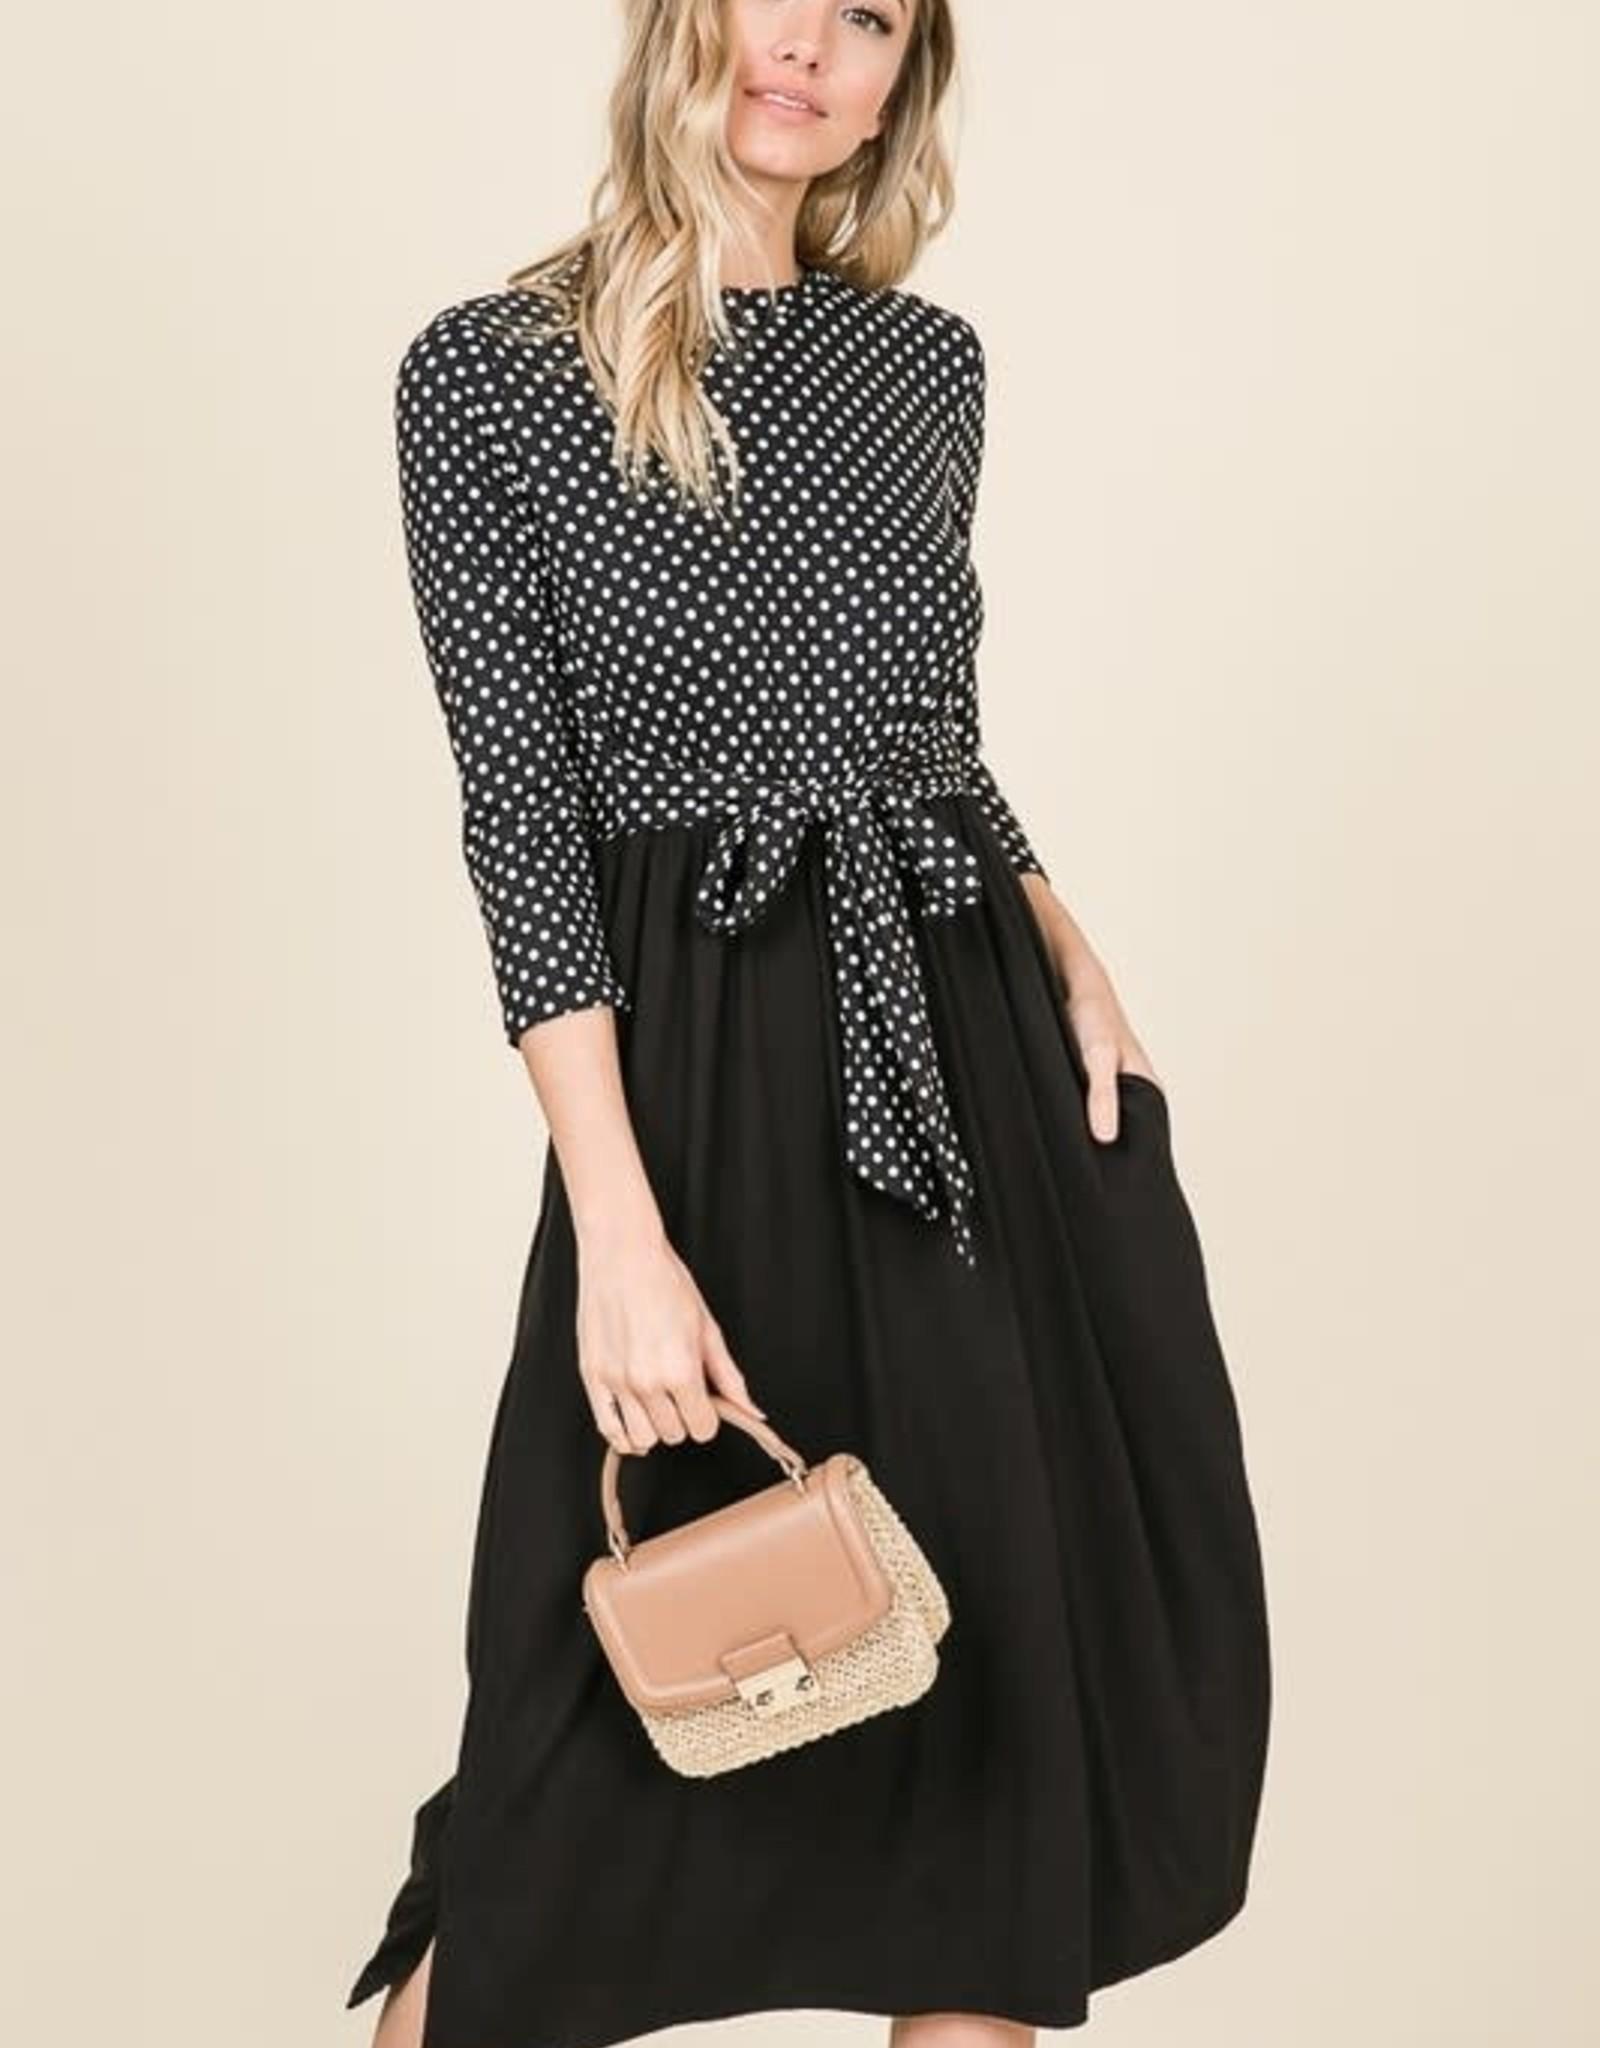 Contrast polka dot & solid waist tie dress